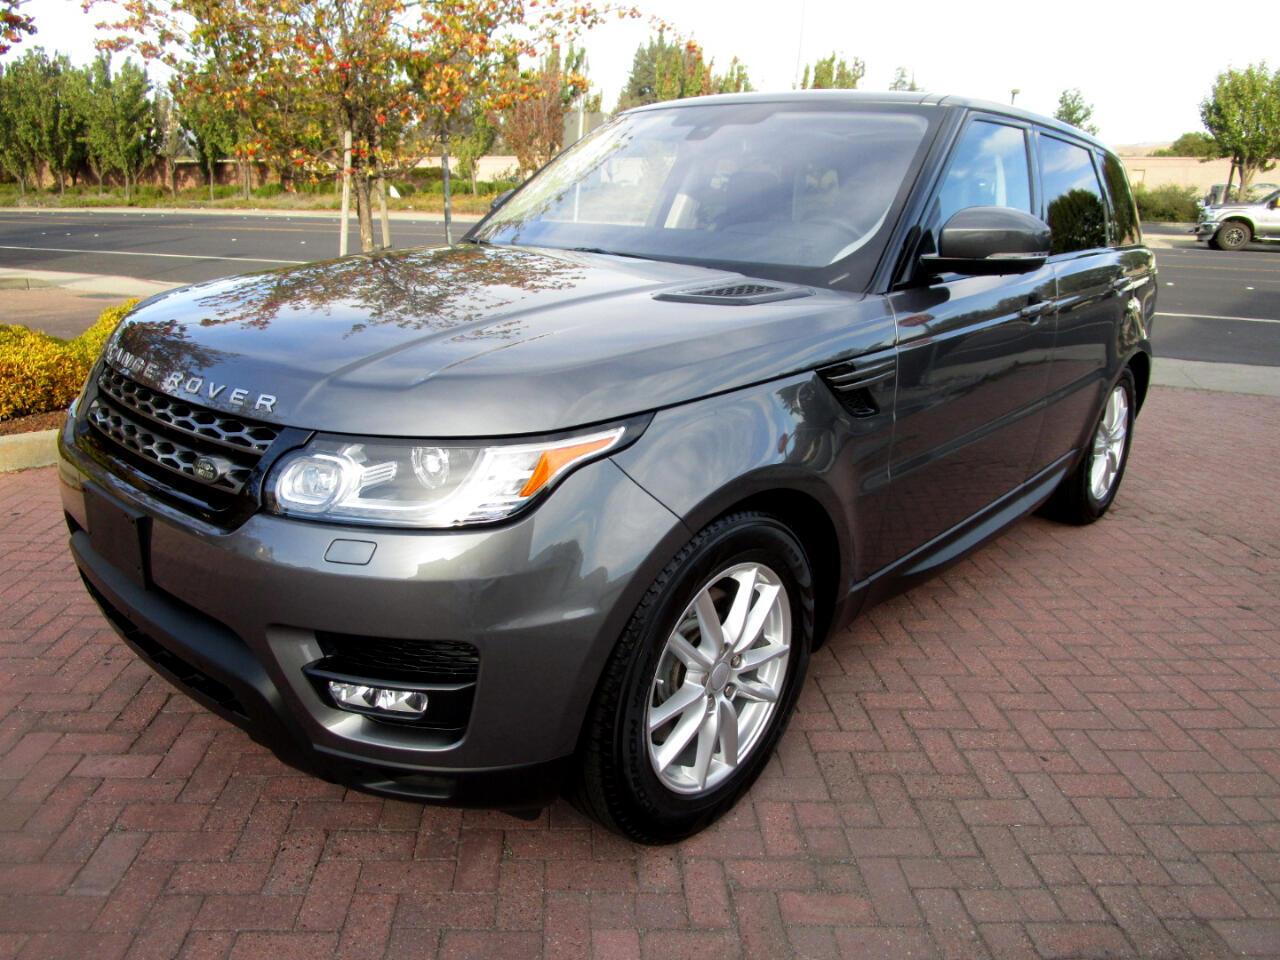 2016 Land Rover Range Rover Sport 4WD SE DIESEL*FRONT/REAR HEATED SEATS*BLIND SPOT*